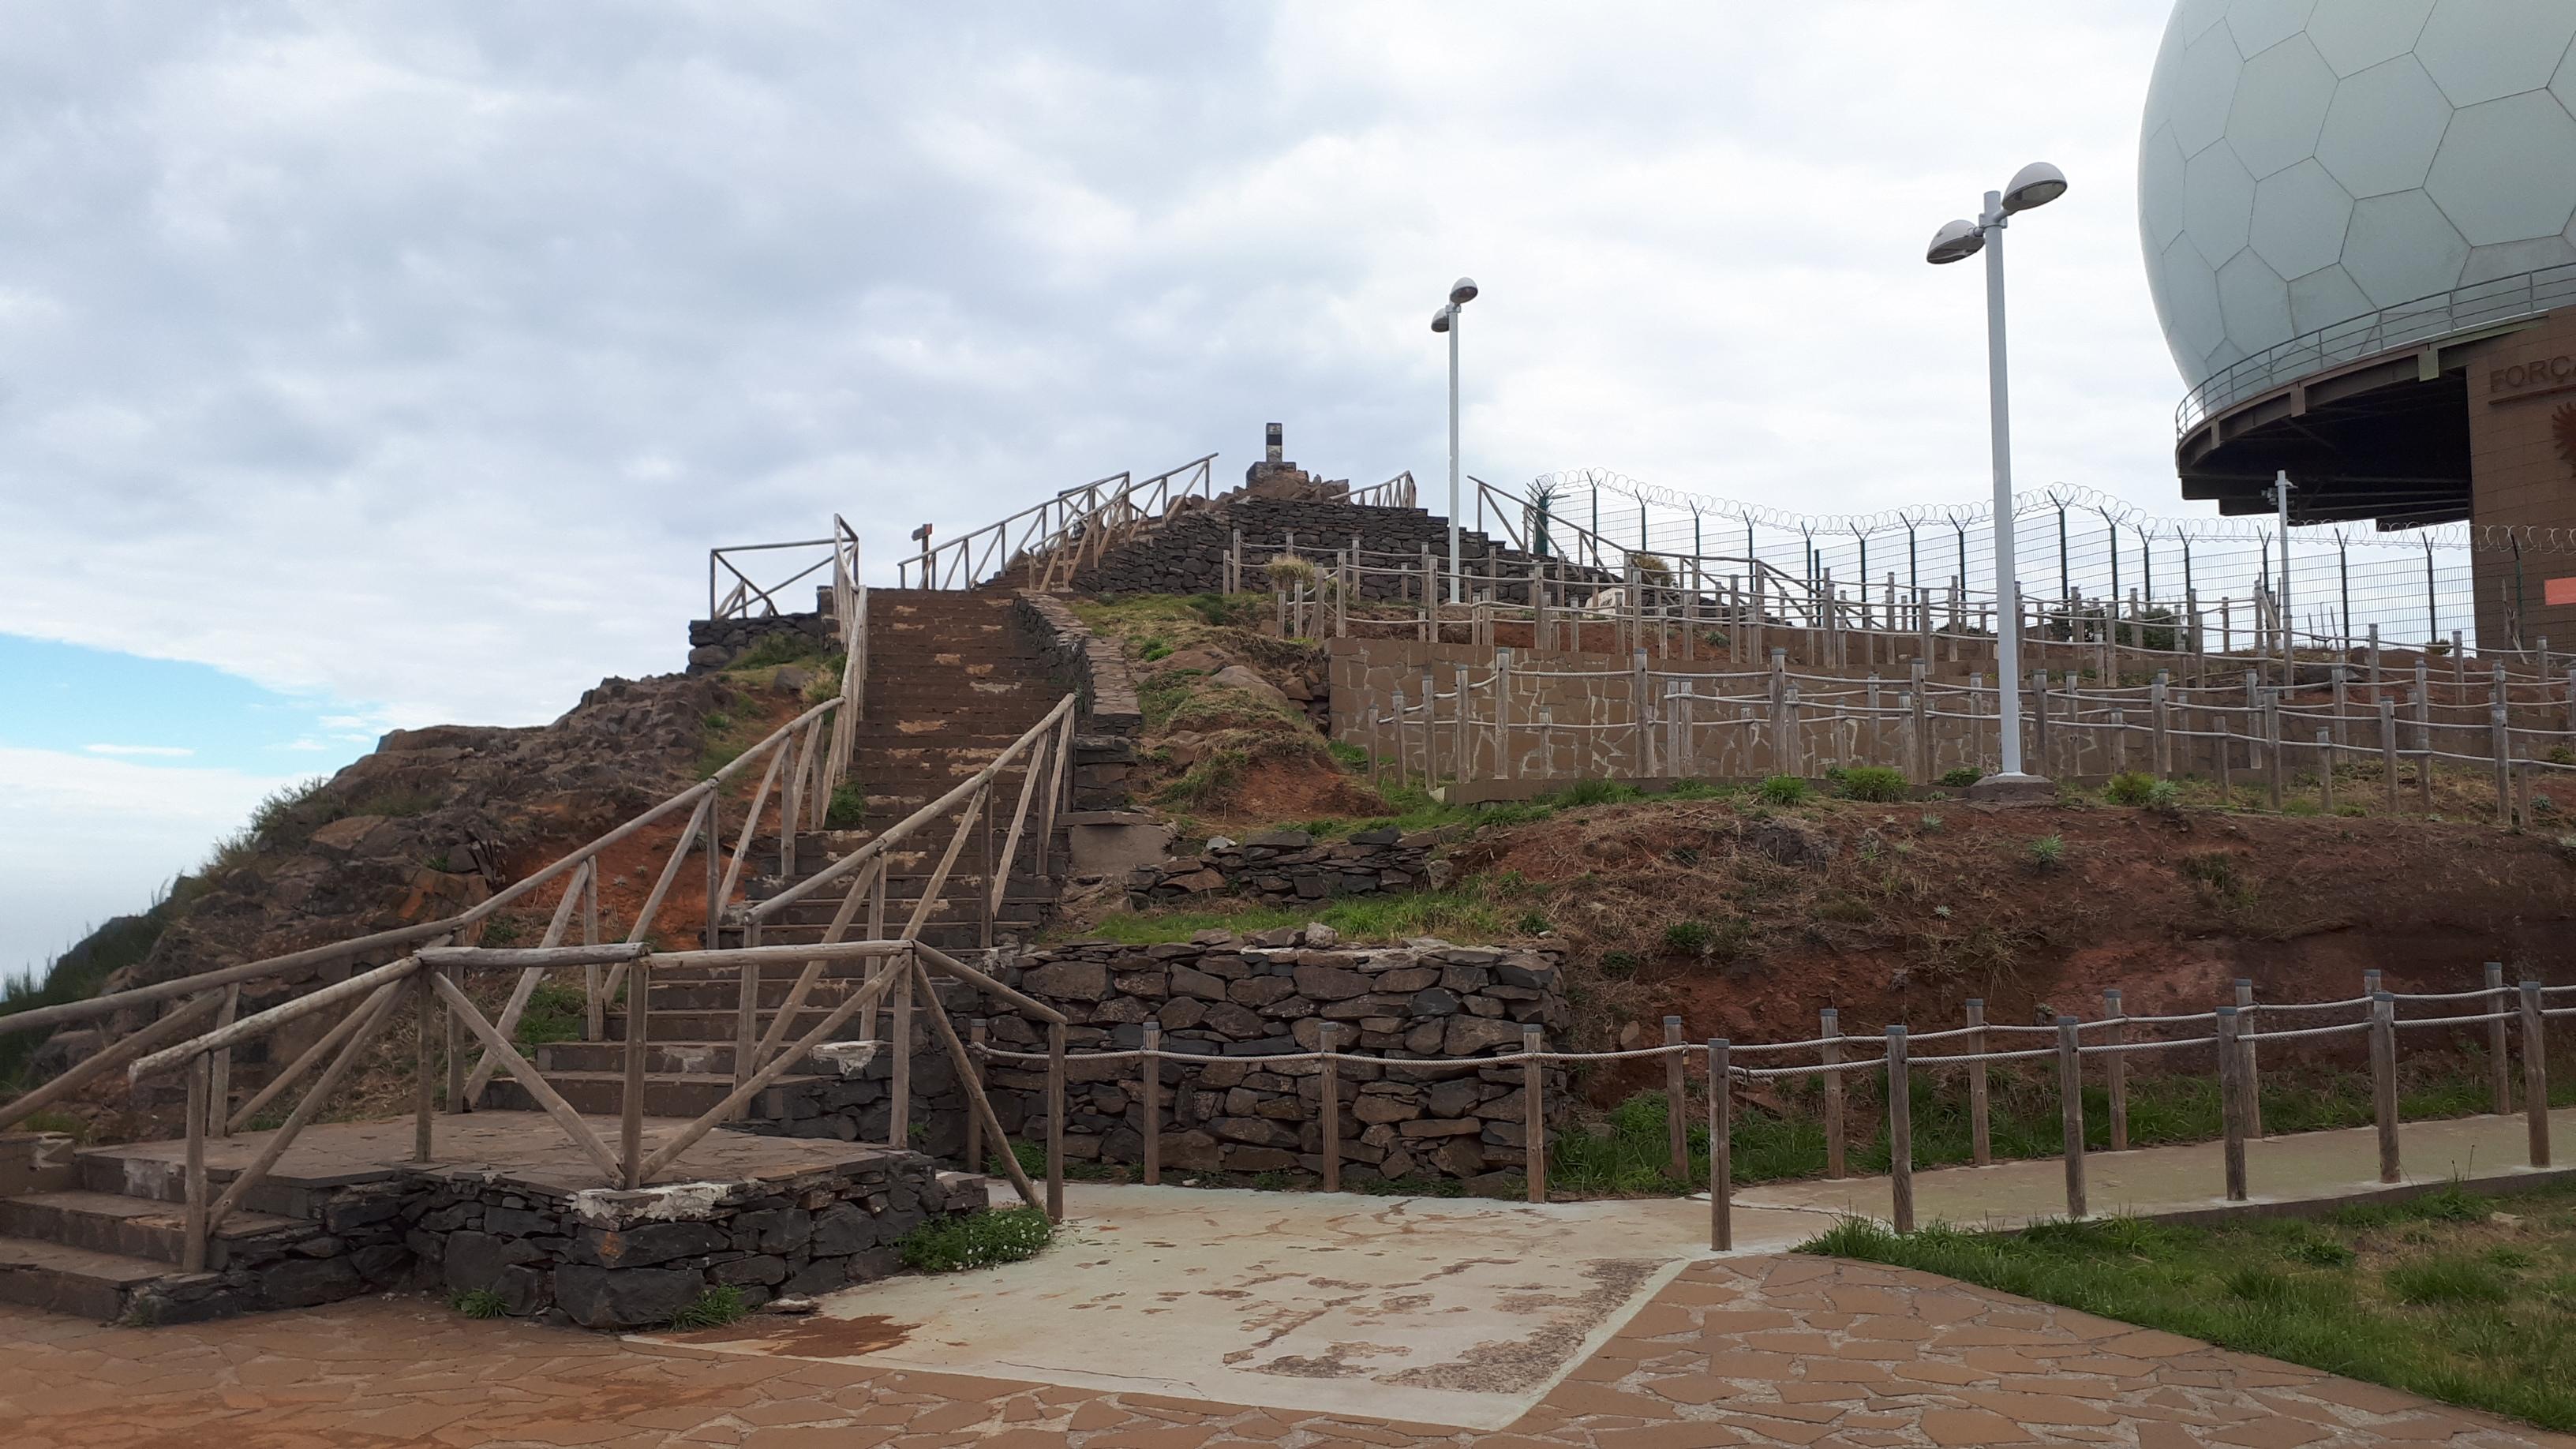 The untidy summit of Pico Areiro